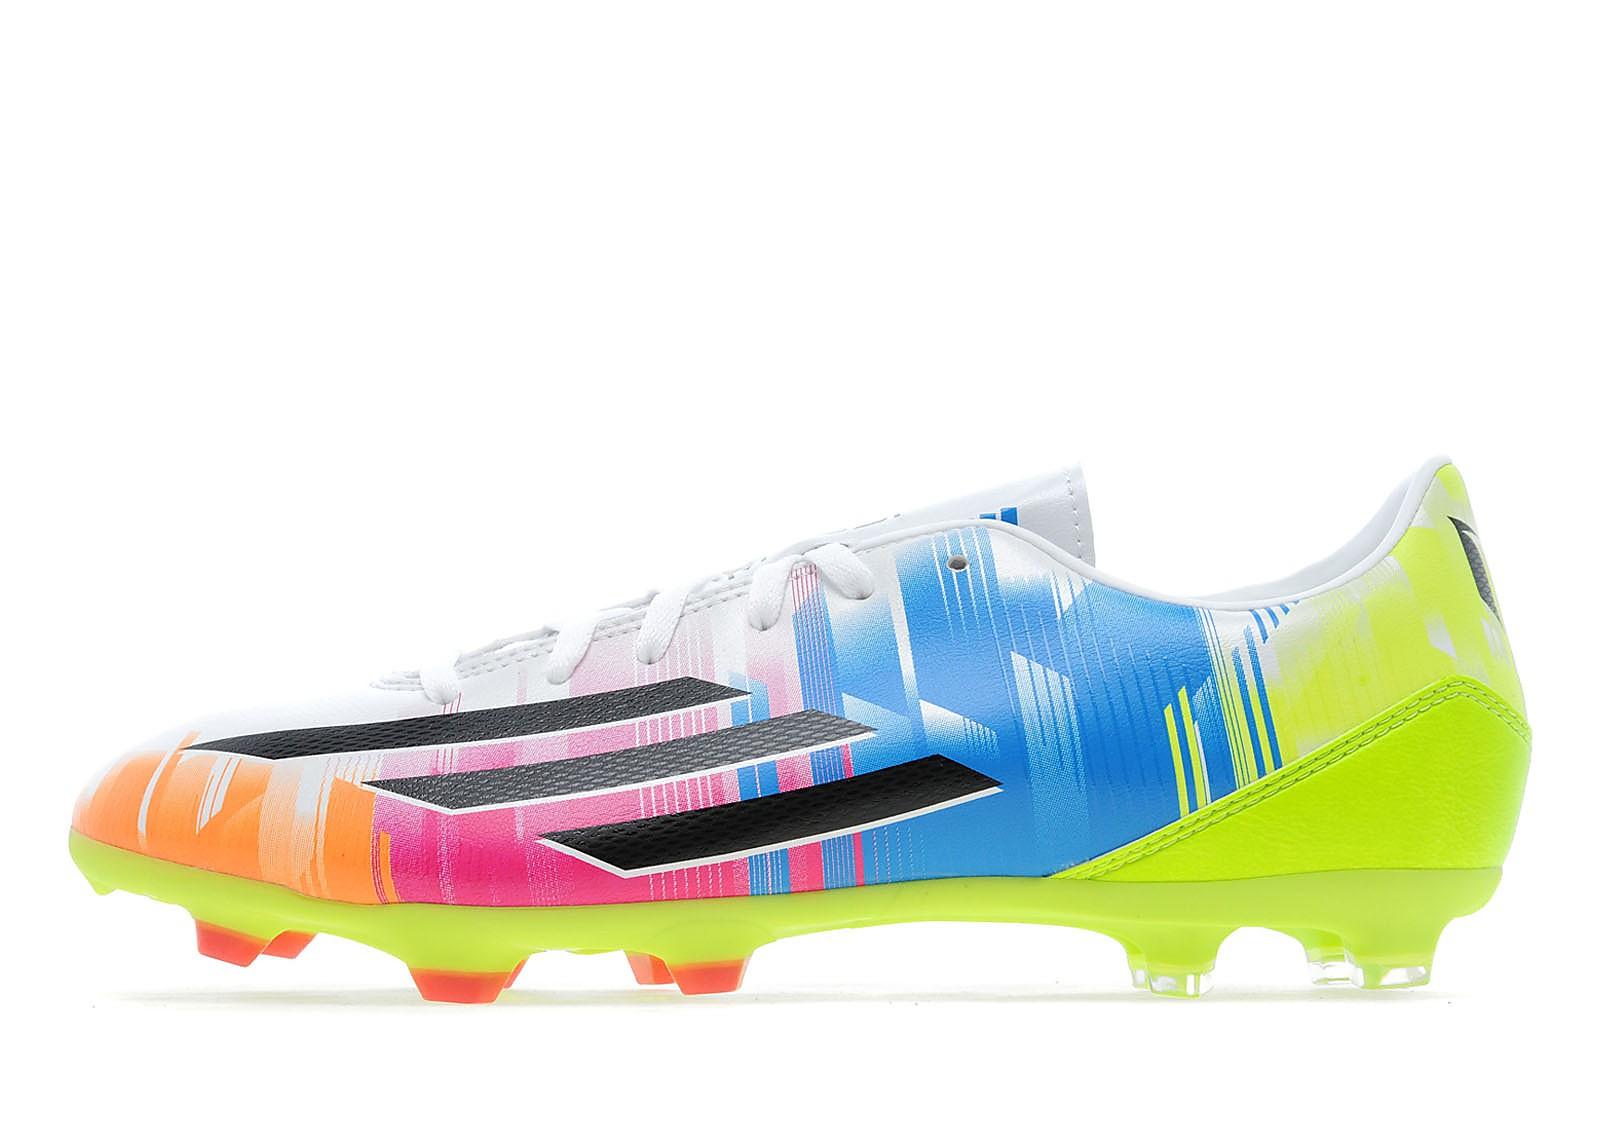 F10 Messi FG